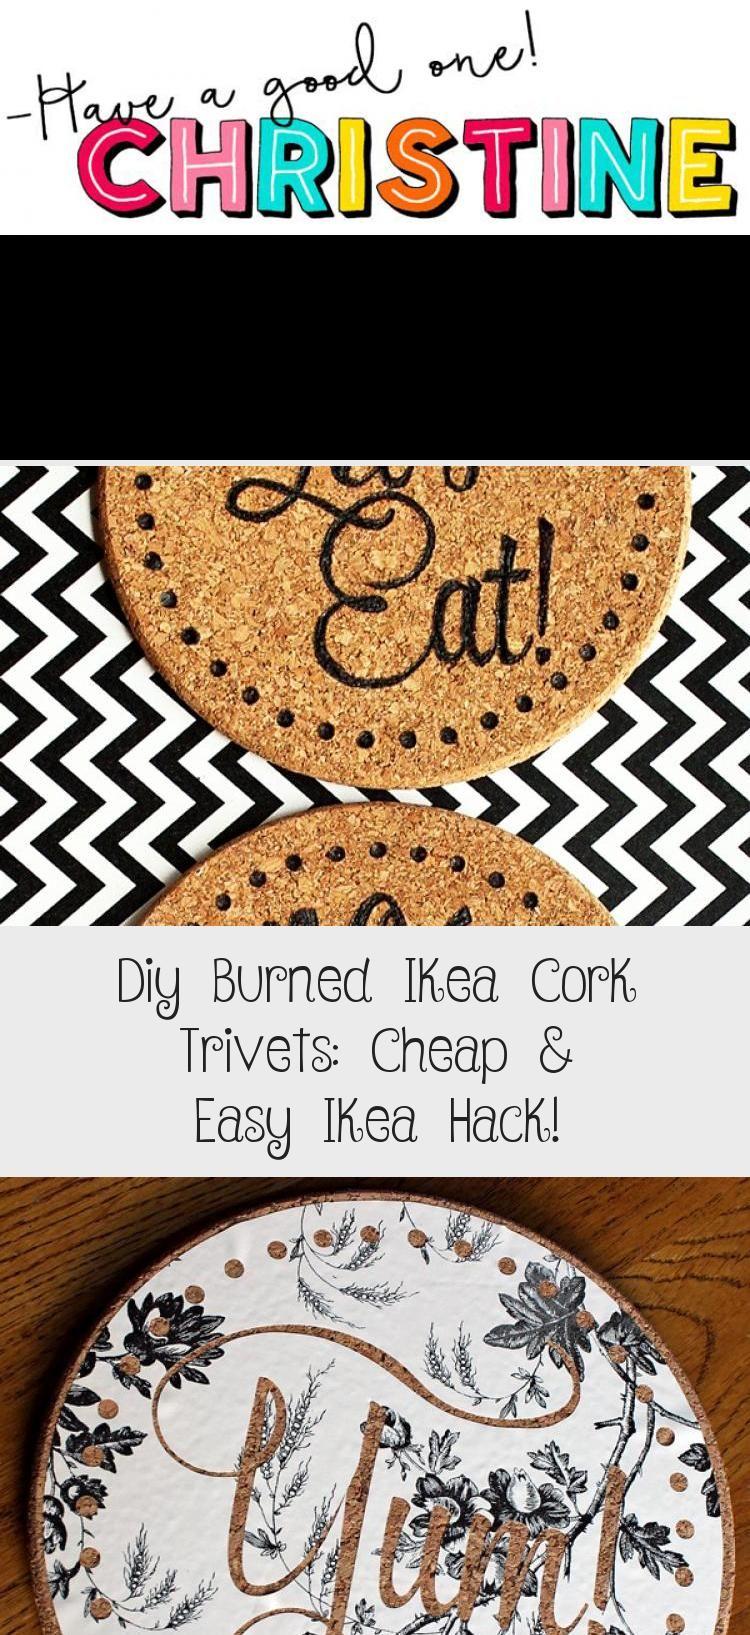 DIY Burned IKEA Cork Trivets: Cheap & Easy IKEA Hack!   Where The Smiles Have Been #IKEA #IKEAhack #cork #corktrivet #corkcoaster #home #corkboard #trivet #coaster #woodburning #pyrography #kitchen #DIYgift #personalizedgift #HomeDecorDIYVideosIdeas #HomeDecorDIYVideosCheap #HomeDecorDIYVideosBedroom #HomeDecorDIYVideosOnABudget #HomeDecorDIYVideosApartment